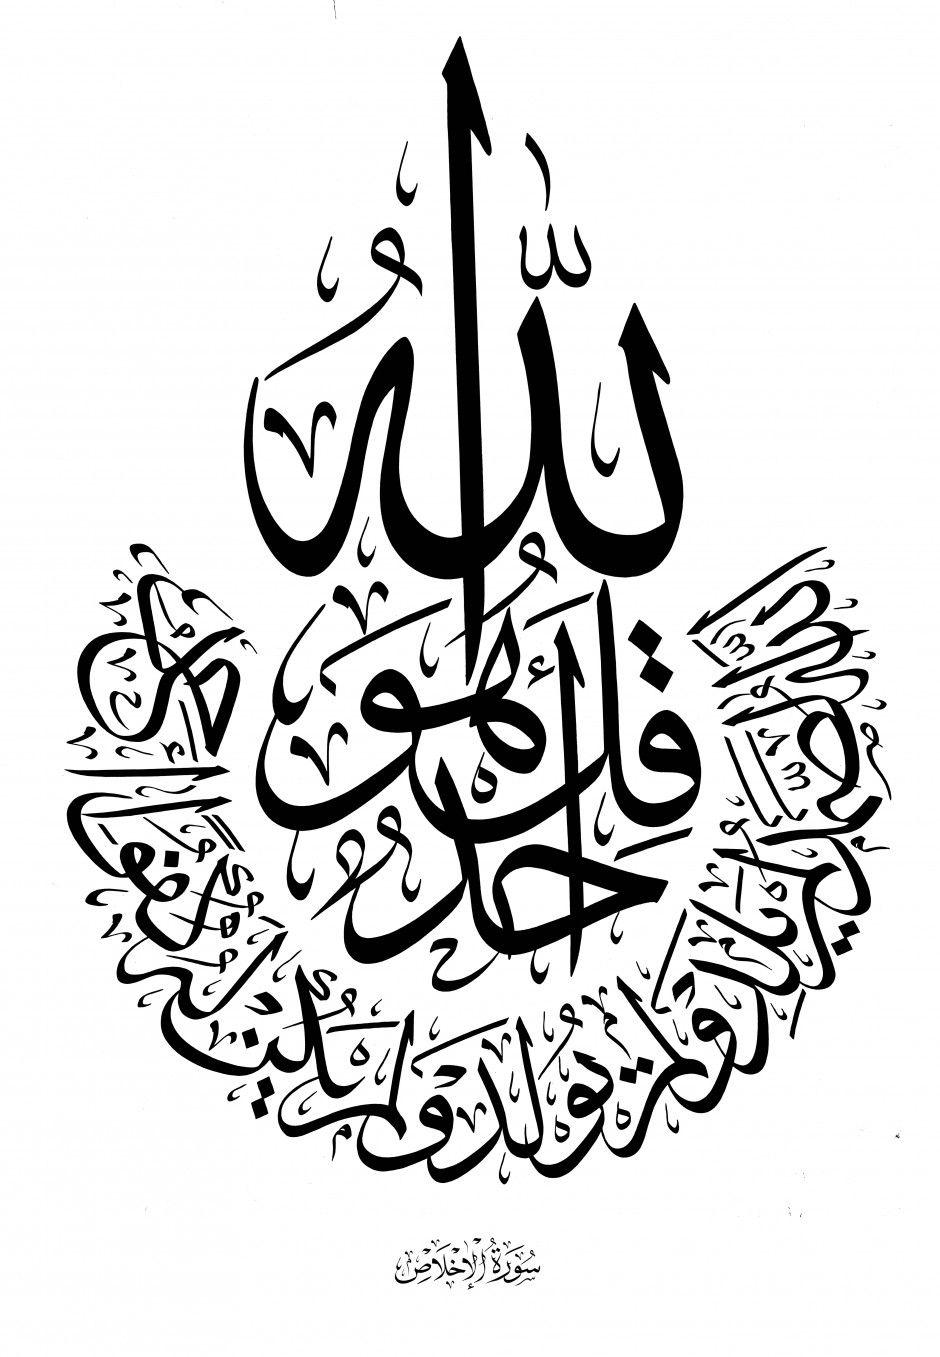 Ayat Kursi Kaligrafi Vector : kursi, kaligrafi, vector, Surah, Ikhlas, Islam, Sanatı,, Islami, Sanat,, Arapça, Kaligrafi